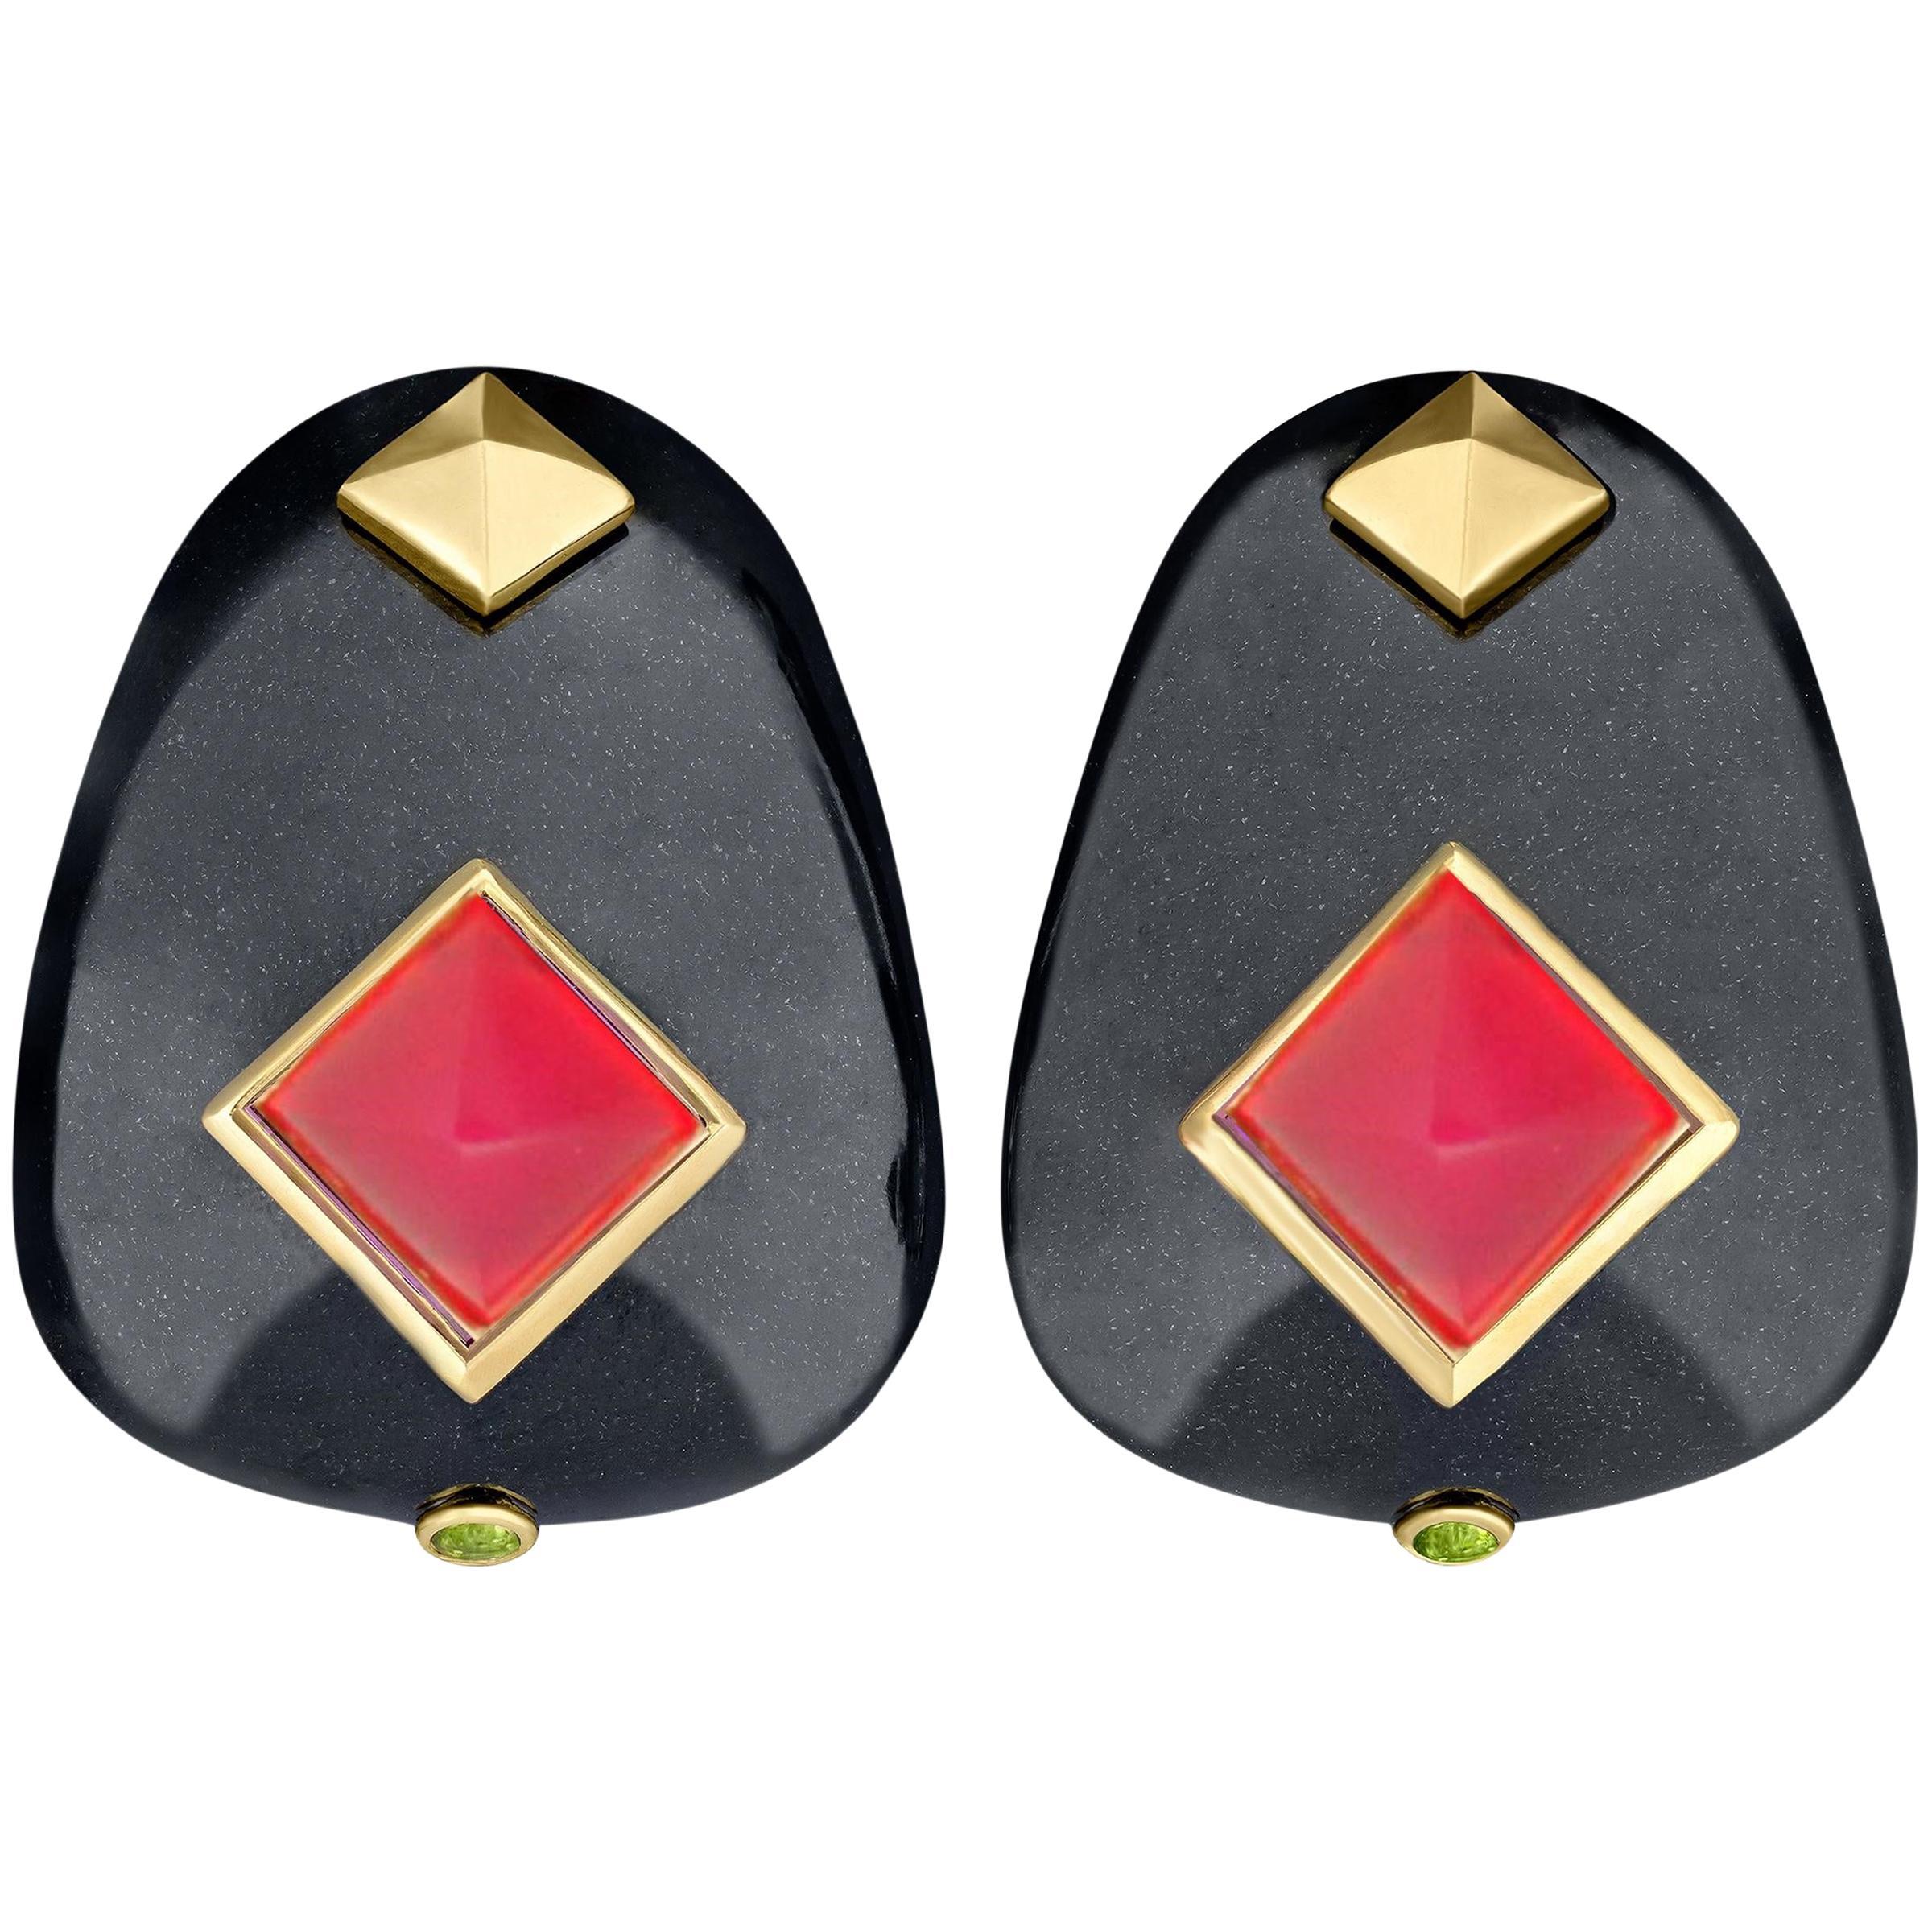 Margot McKinney Black Jade Pyramid Earrings, Red Chalcedony, Tsavorite Garnets